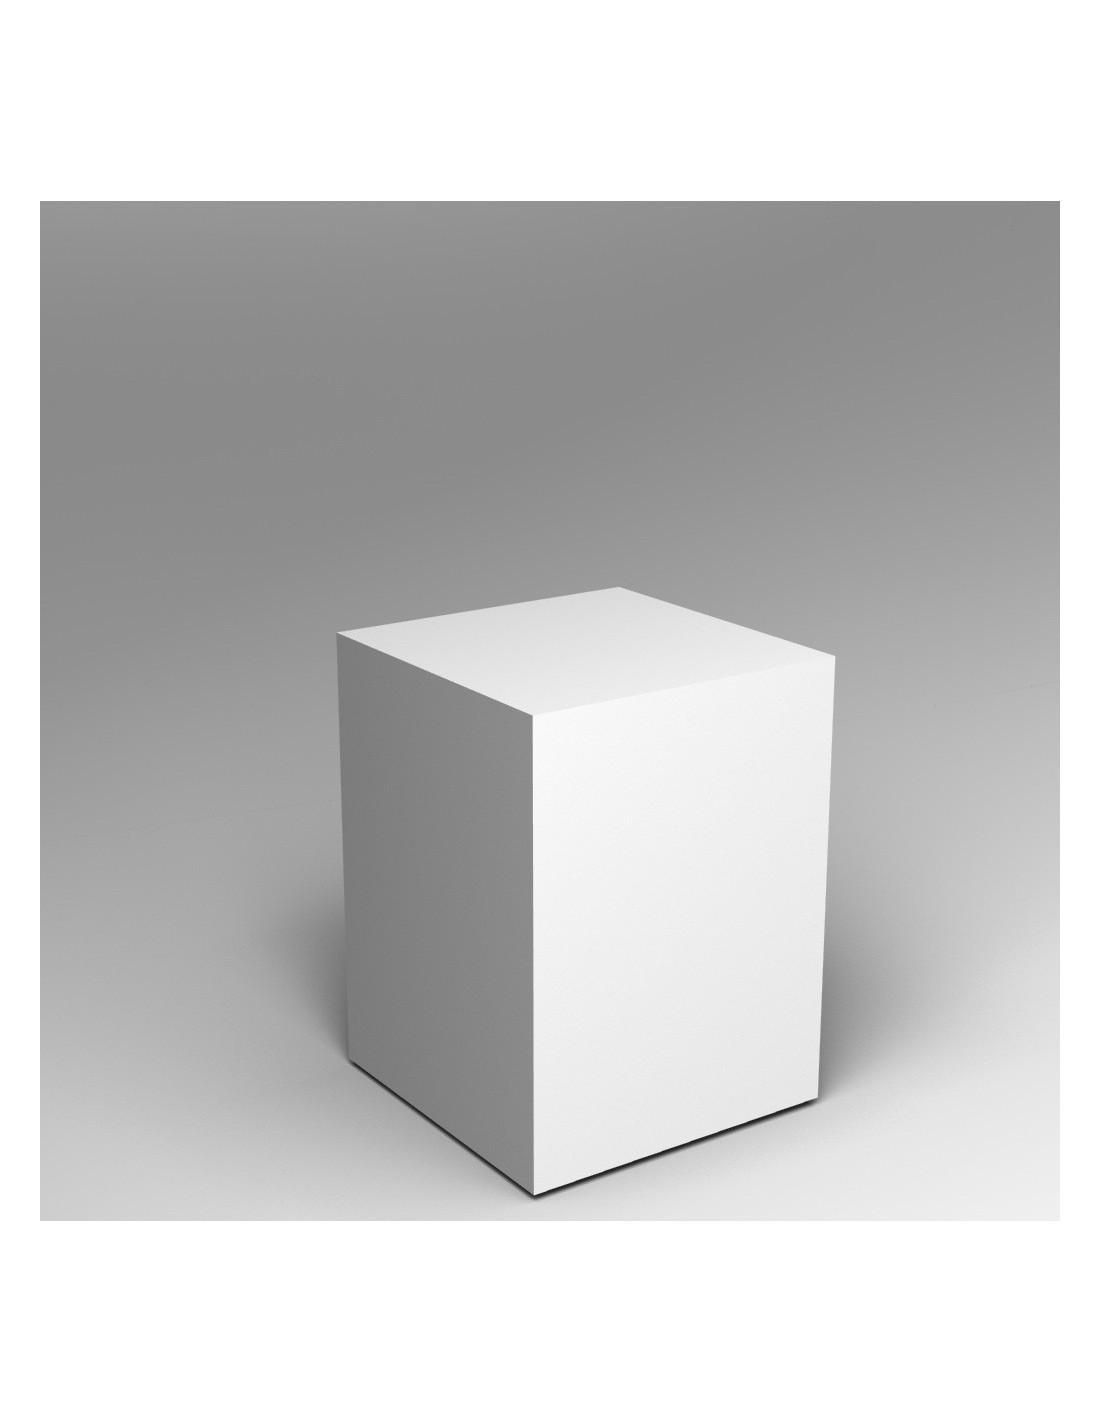 plinth hire by artplinths hire 80h x 60wd cm display plinths london. Black Bedroom Furniture Sets. Home Design Ideas